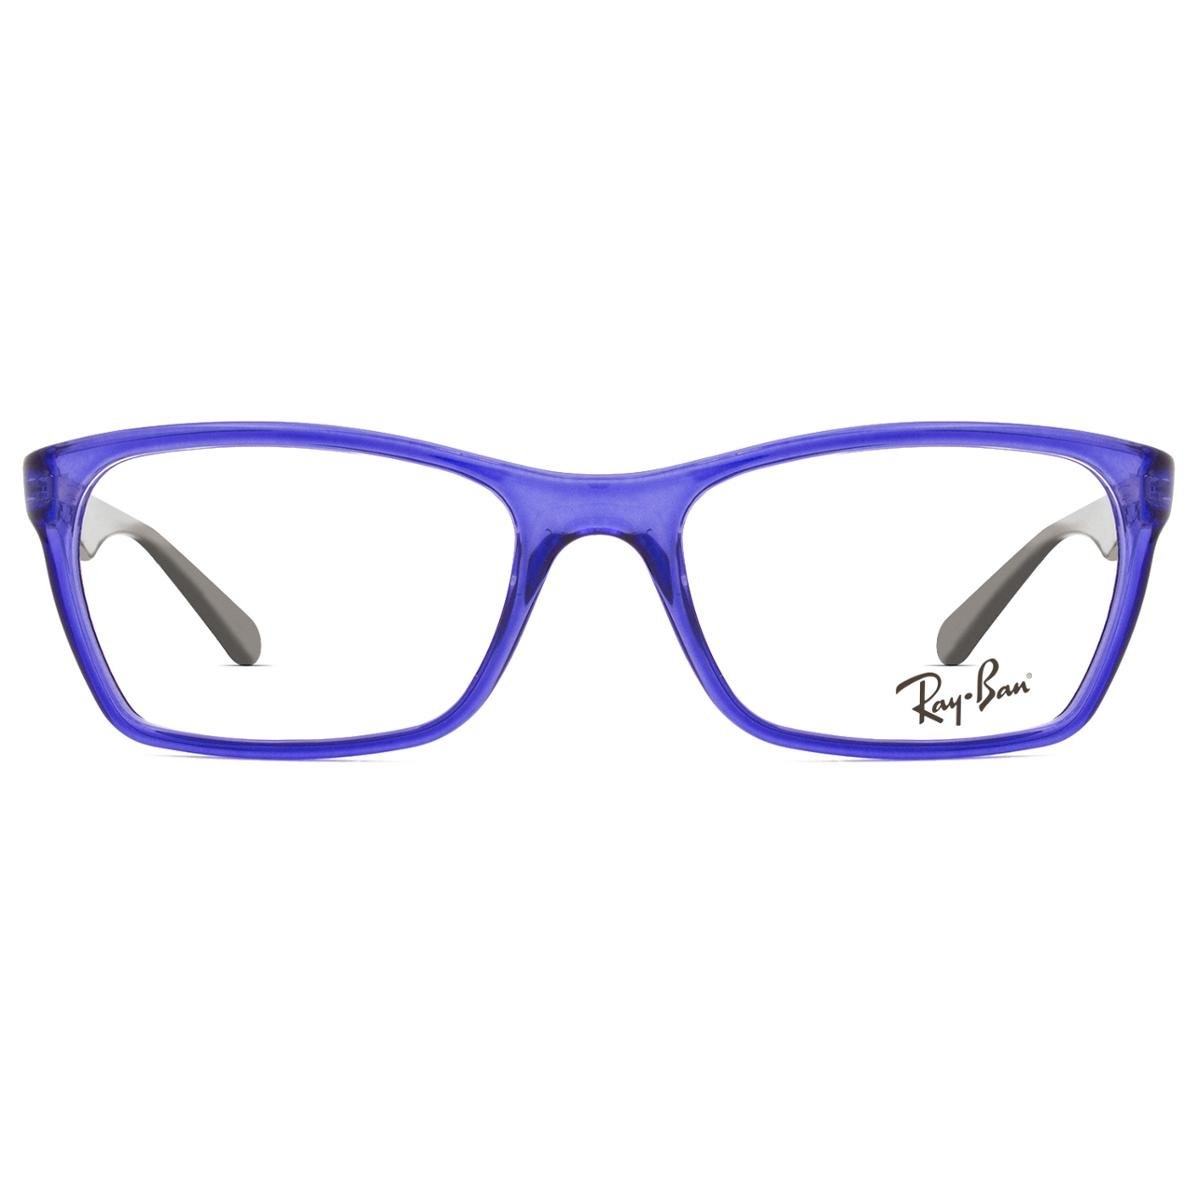 4fb3ff7f6 Armação Óculos de Grau Ray Ban RX7033L 5444-52 - Azul | Netshoes